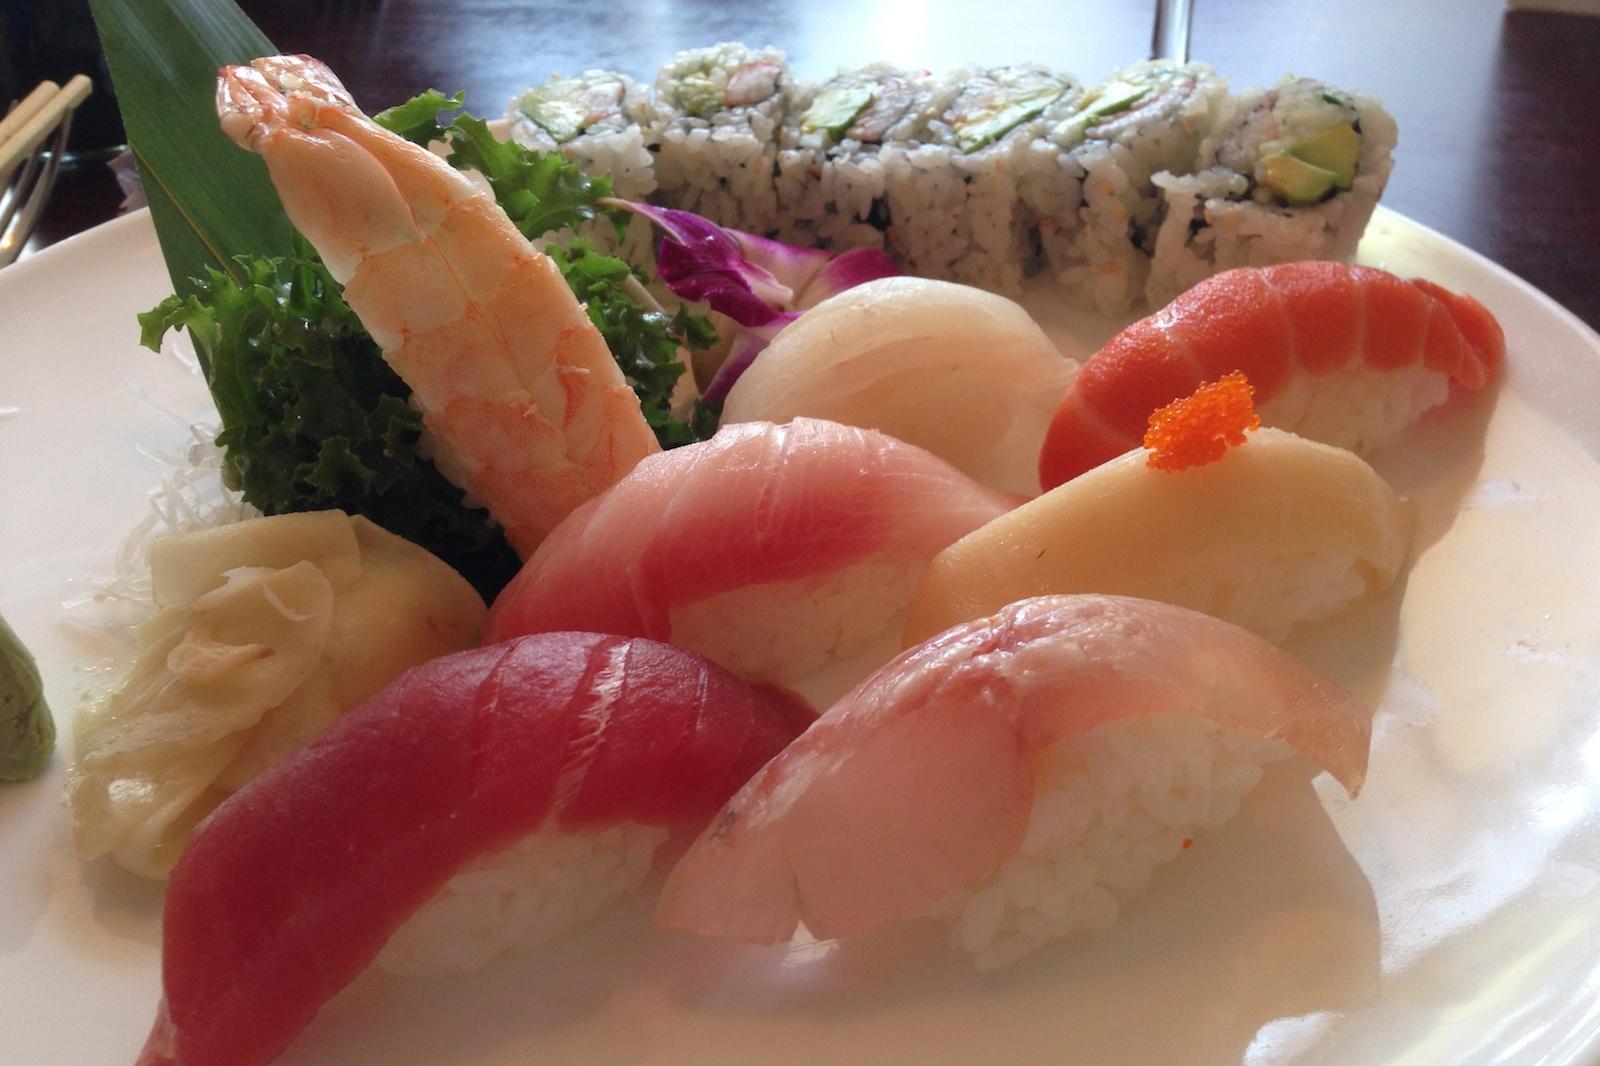 http://blog.rickk.com/food/2014/08/27/ate.2014.08.27.d.jpg